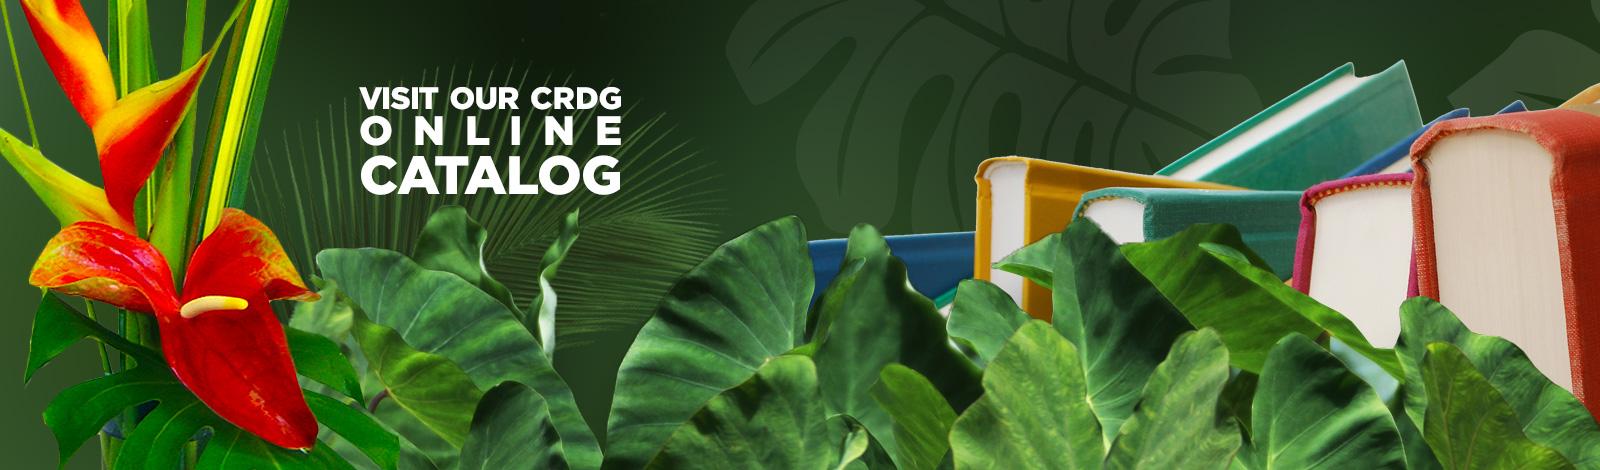 crdg-online-catalog